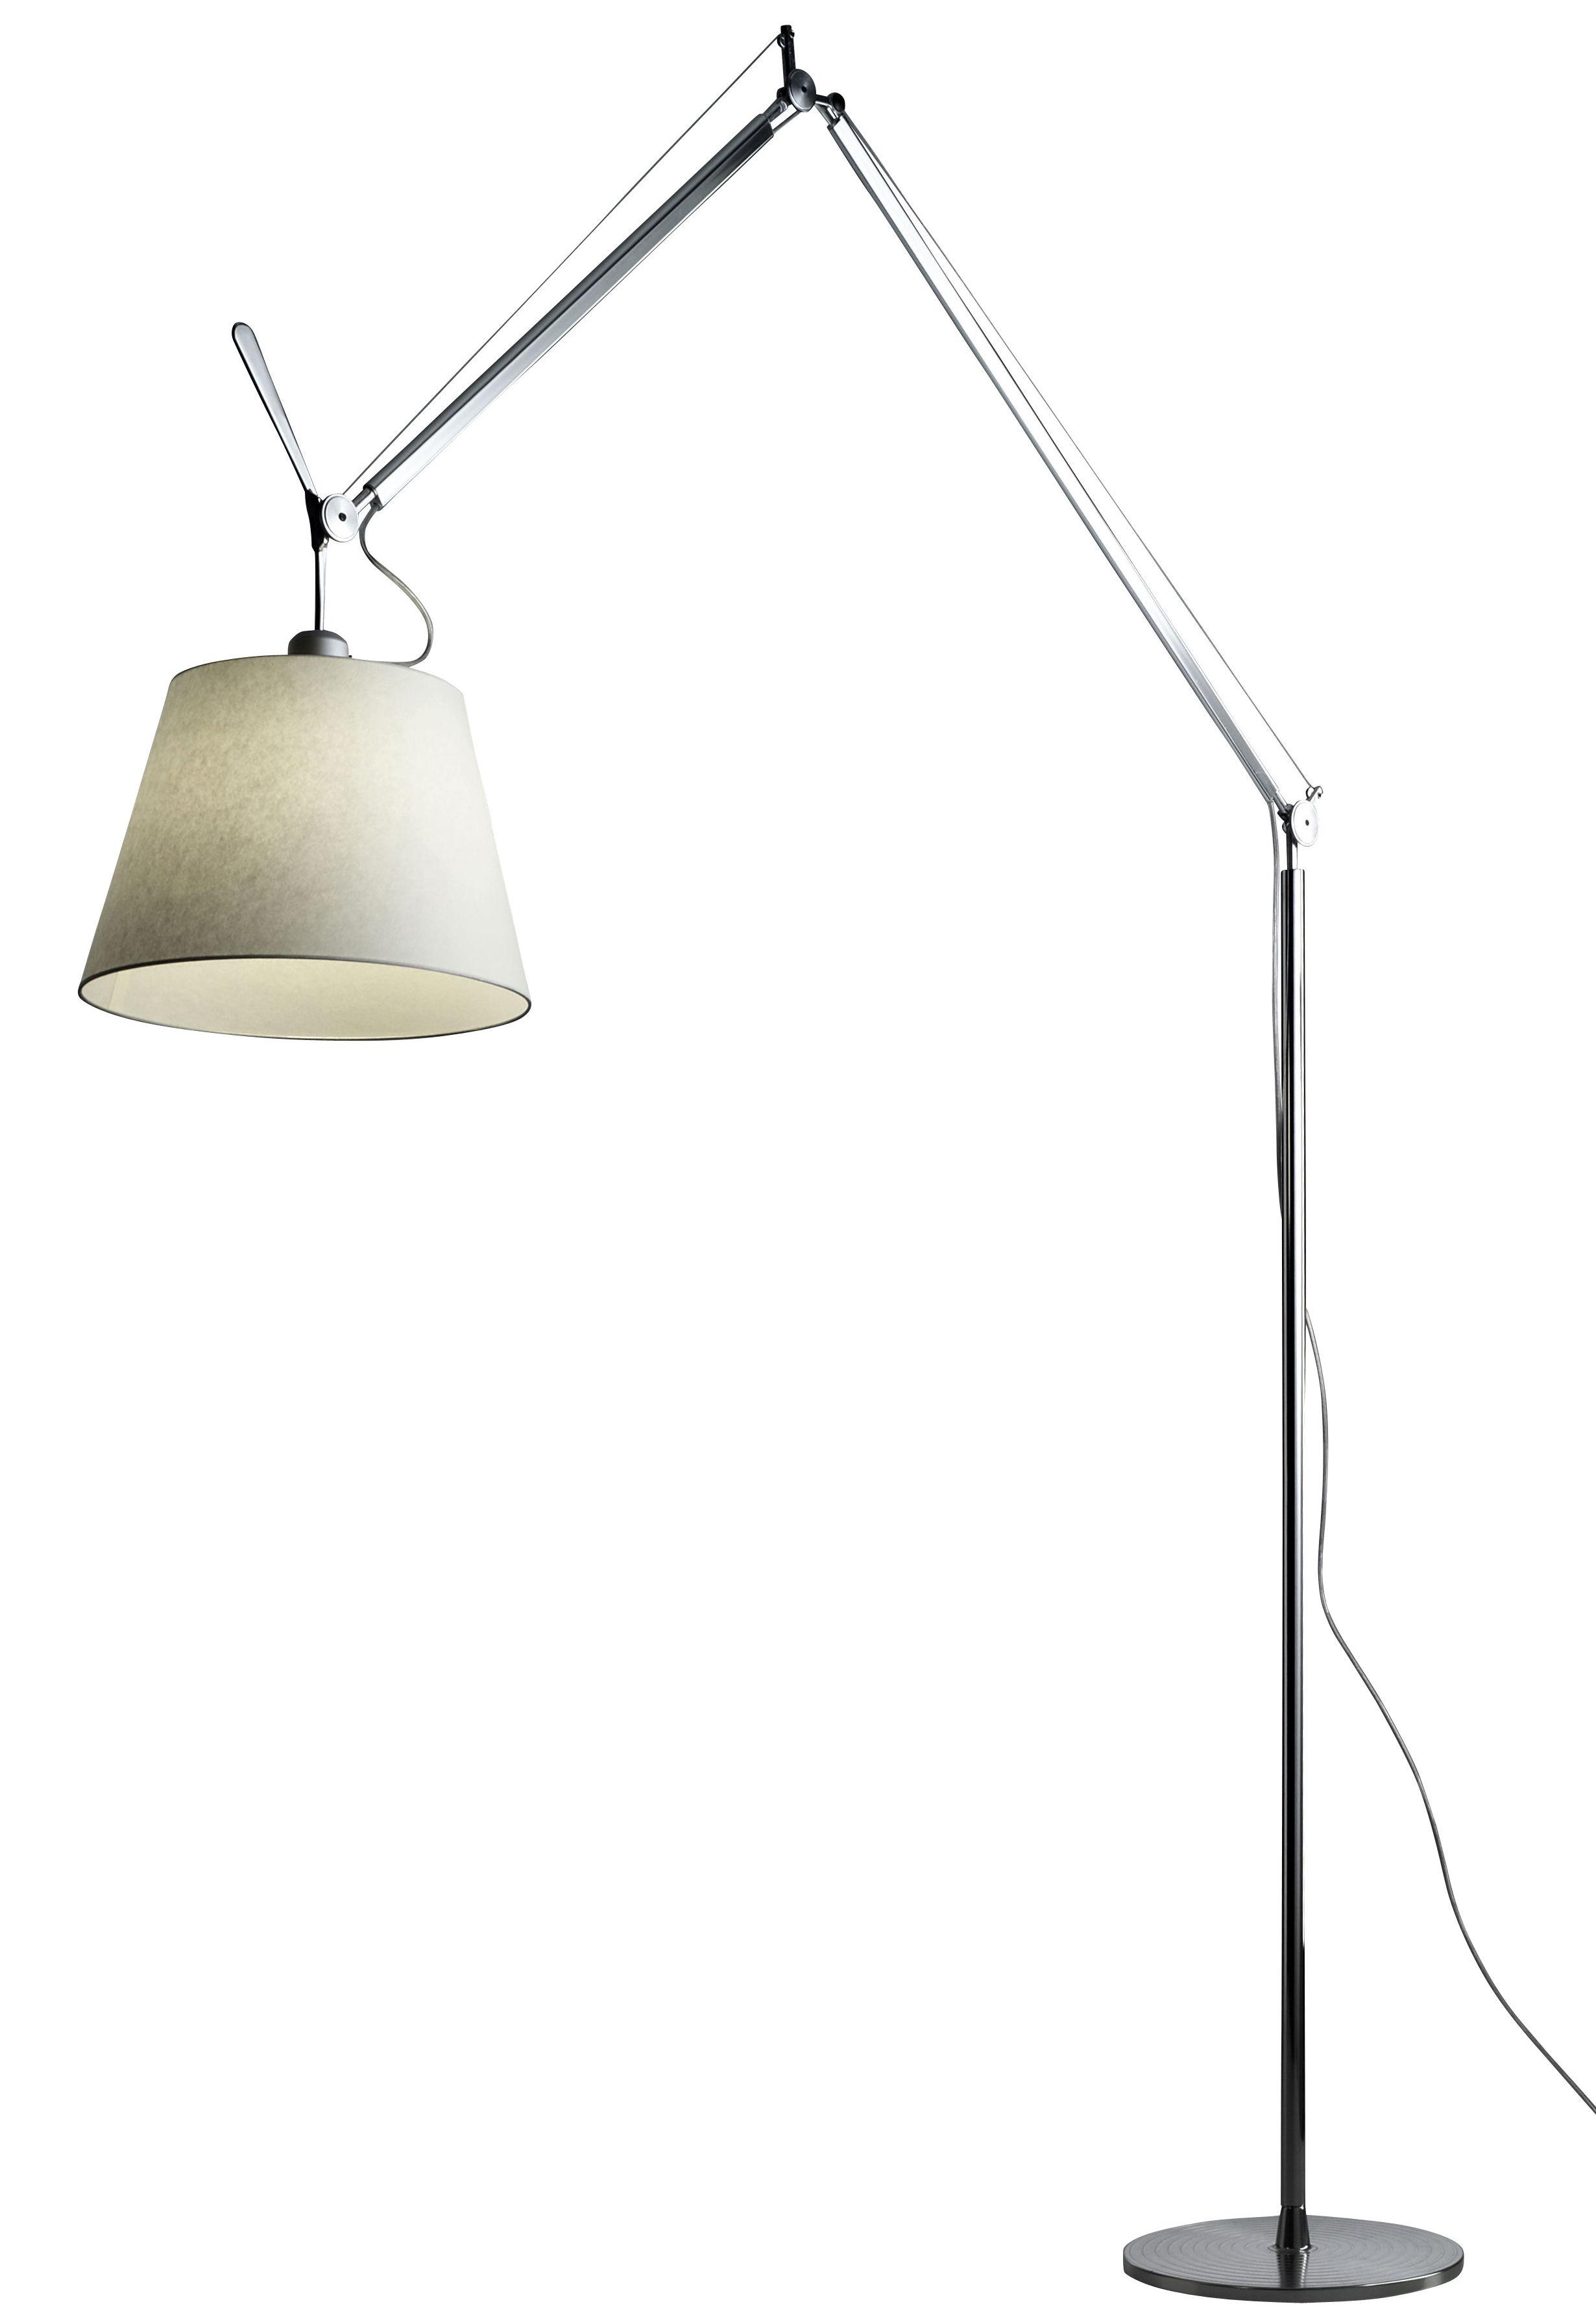 Lighting - Floor lamps - Tolomeo Mega LED Floor lamp by Artemide - Lampshade Ø 42 cm / Beige - Parchment paper, Polished aluminium